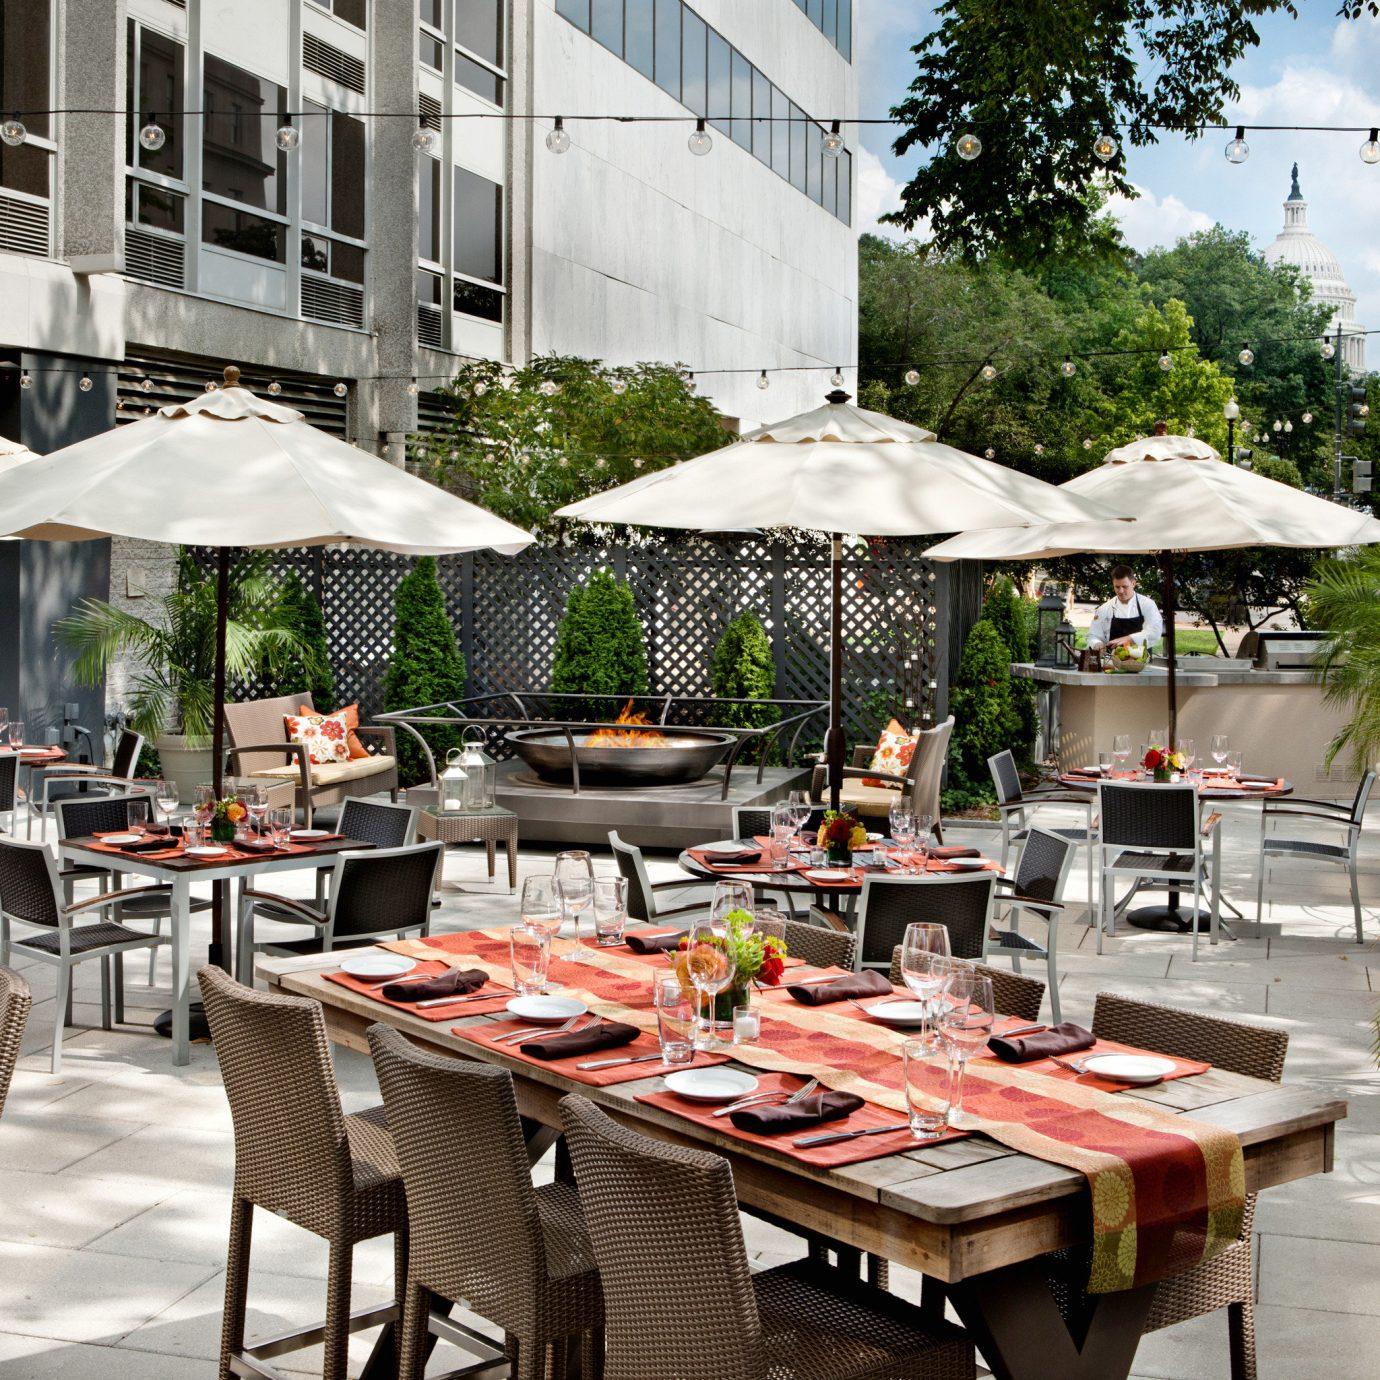 Boutique City Deck Dining Drink Eat Modern Patio tree restaurant set